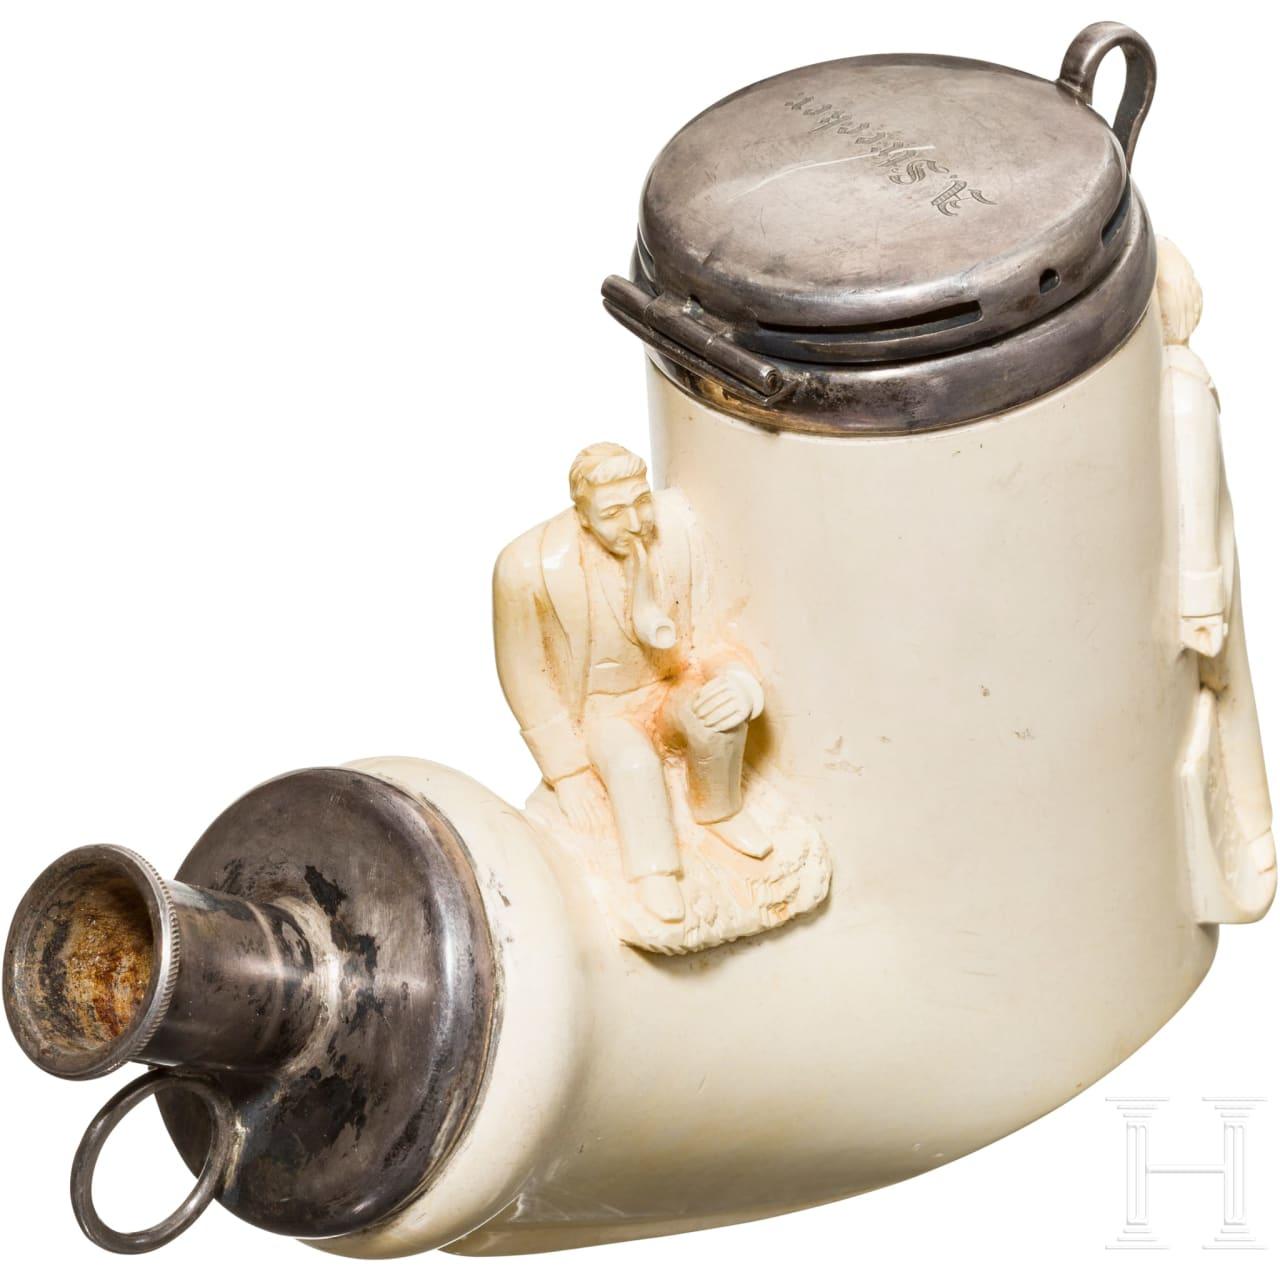 Adolph Strecker (1822 - 1871) - a silver-framed meerschaum pipe bowl in chemist's case